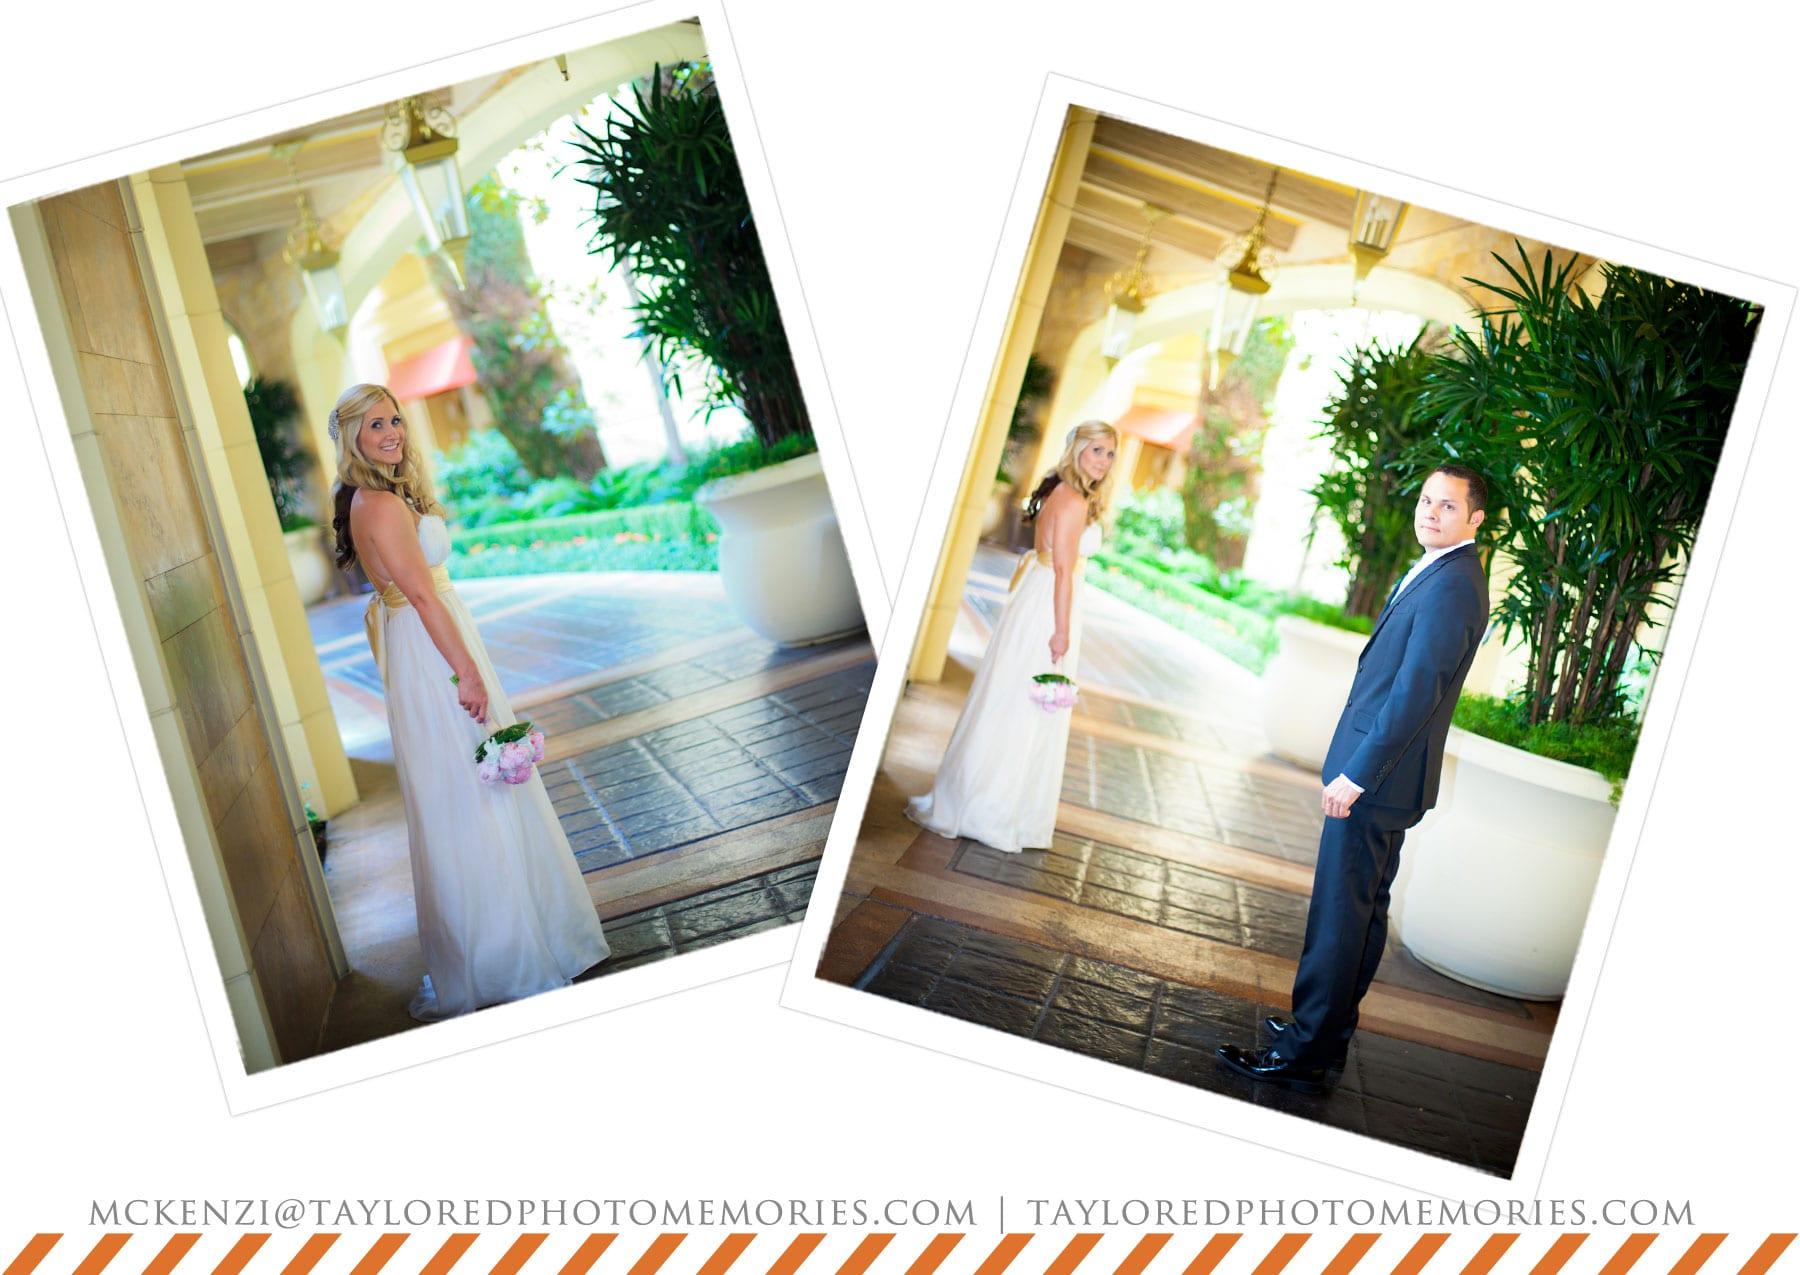 Taylored Photo Memories Mgm Grand Terrace Suite Wedding In Las Vegas Elopement